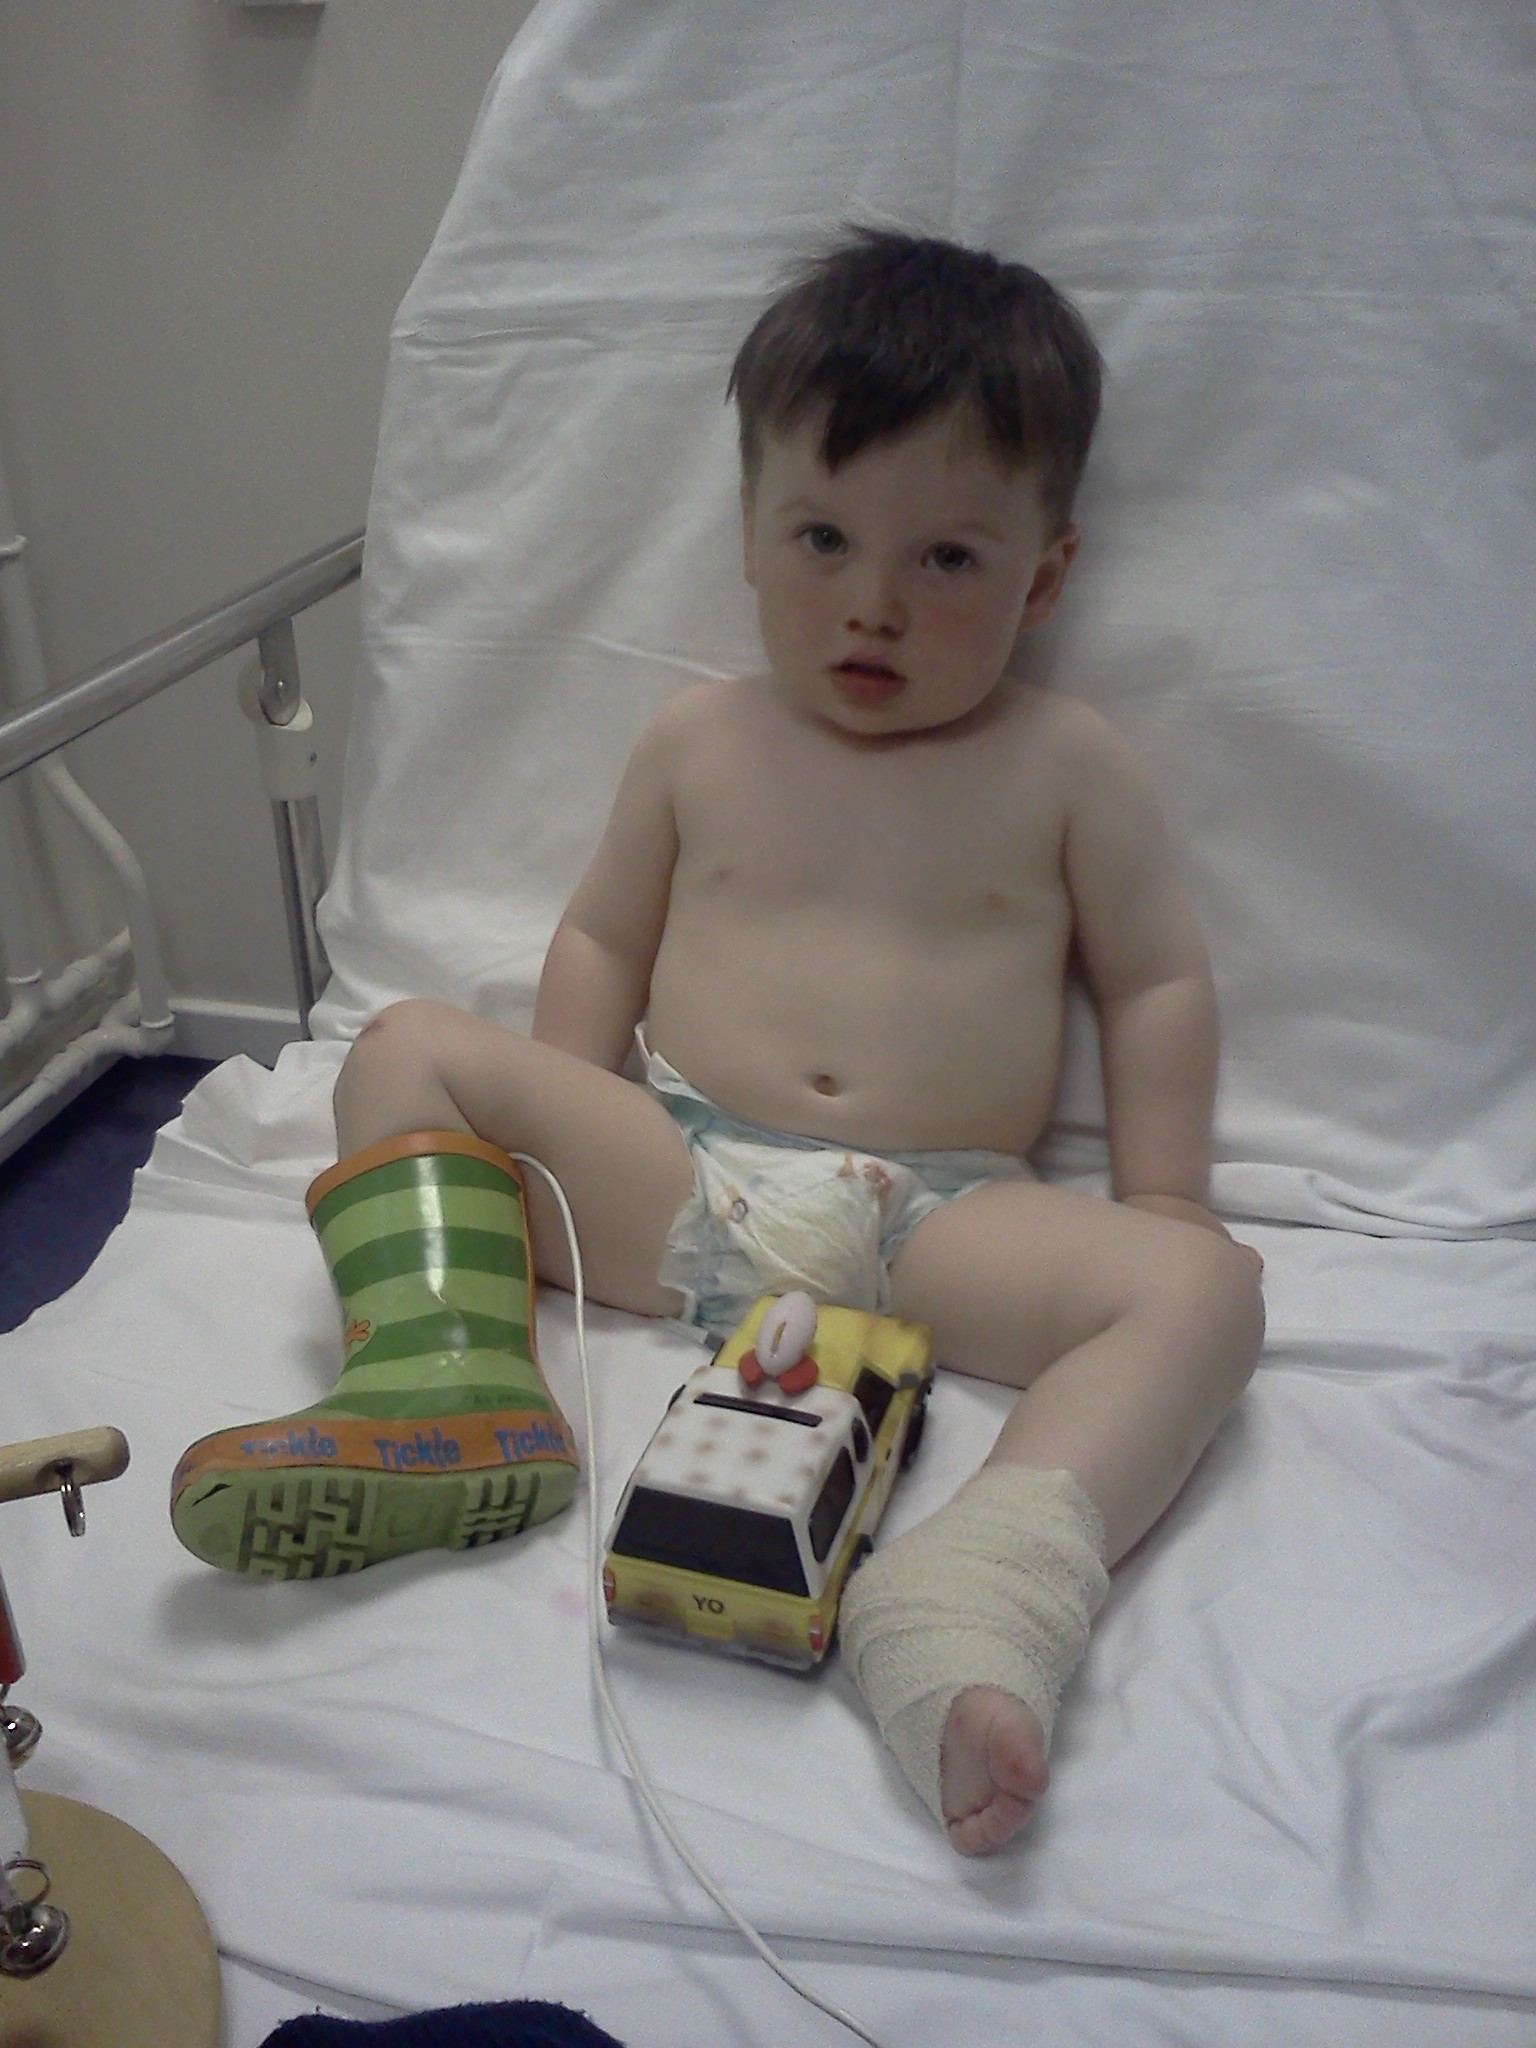 Sick Kids A&E team stabilise Noah